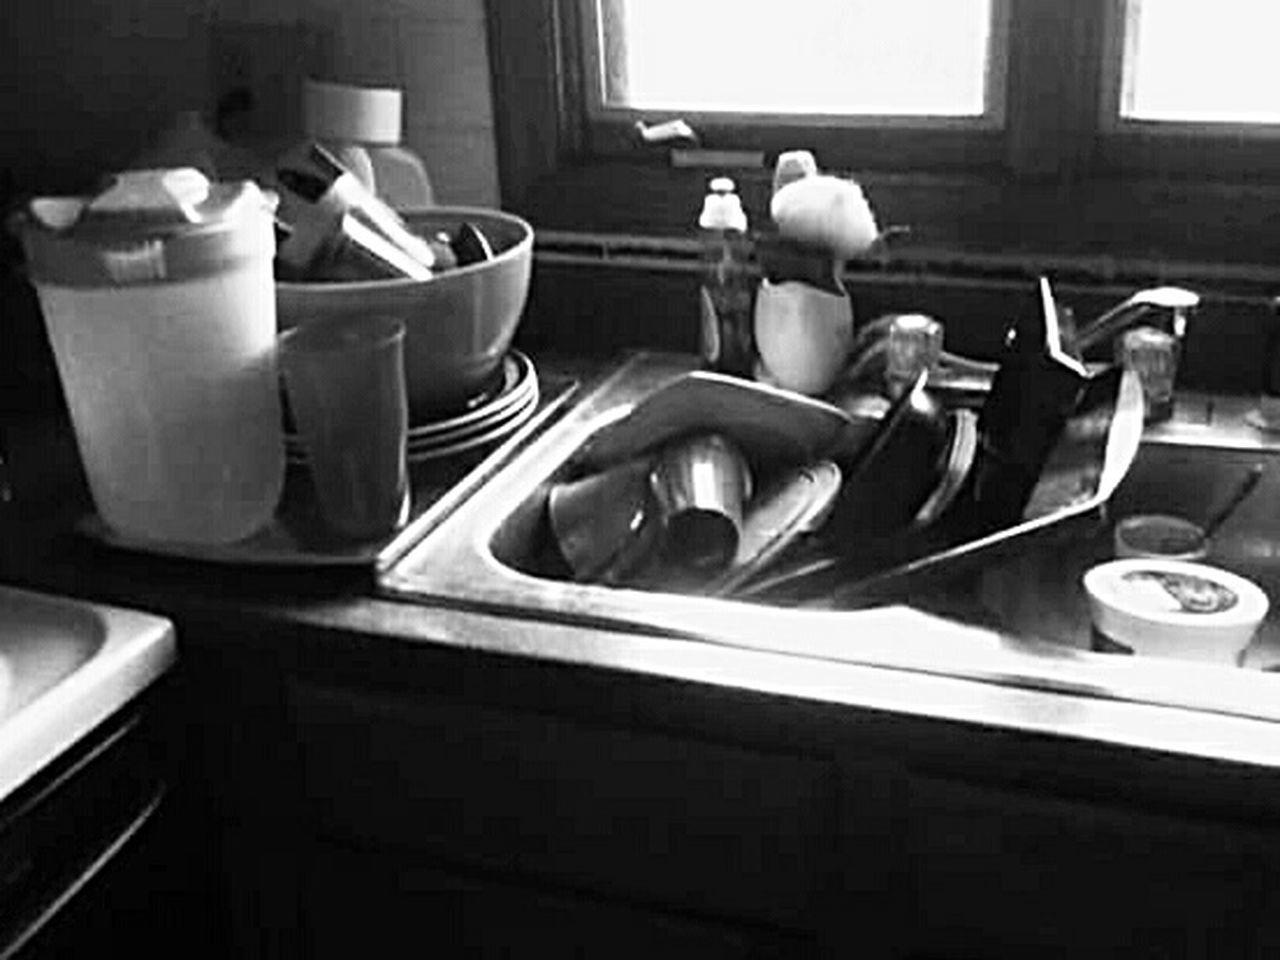 indoors, domestic room, domestic kitchen, stove, kitchen, burner - stove top, no people, food, basement, day, close-up